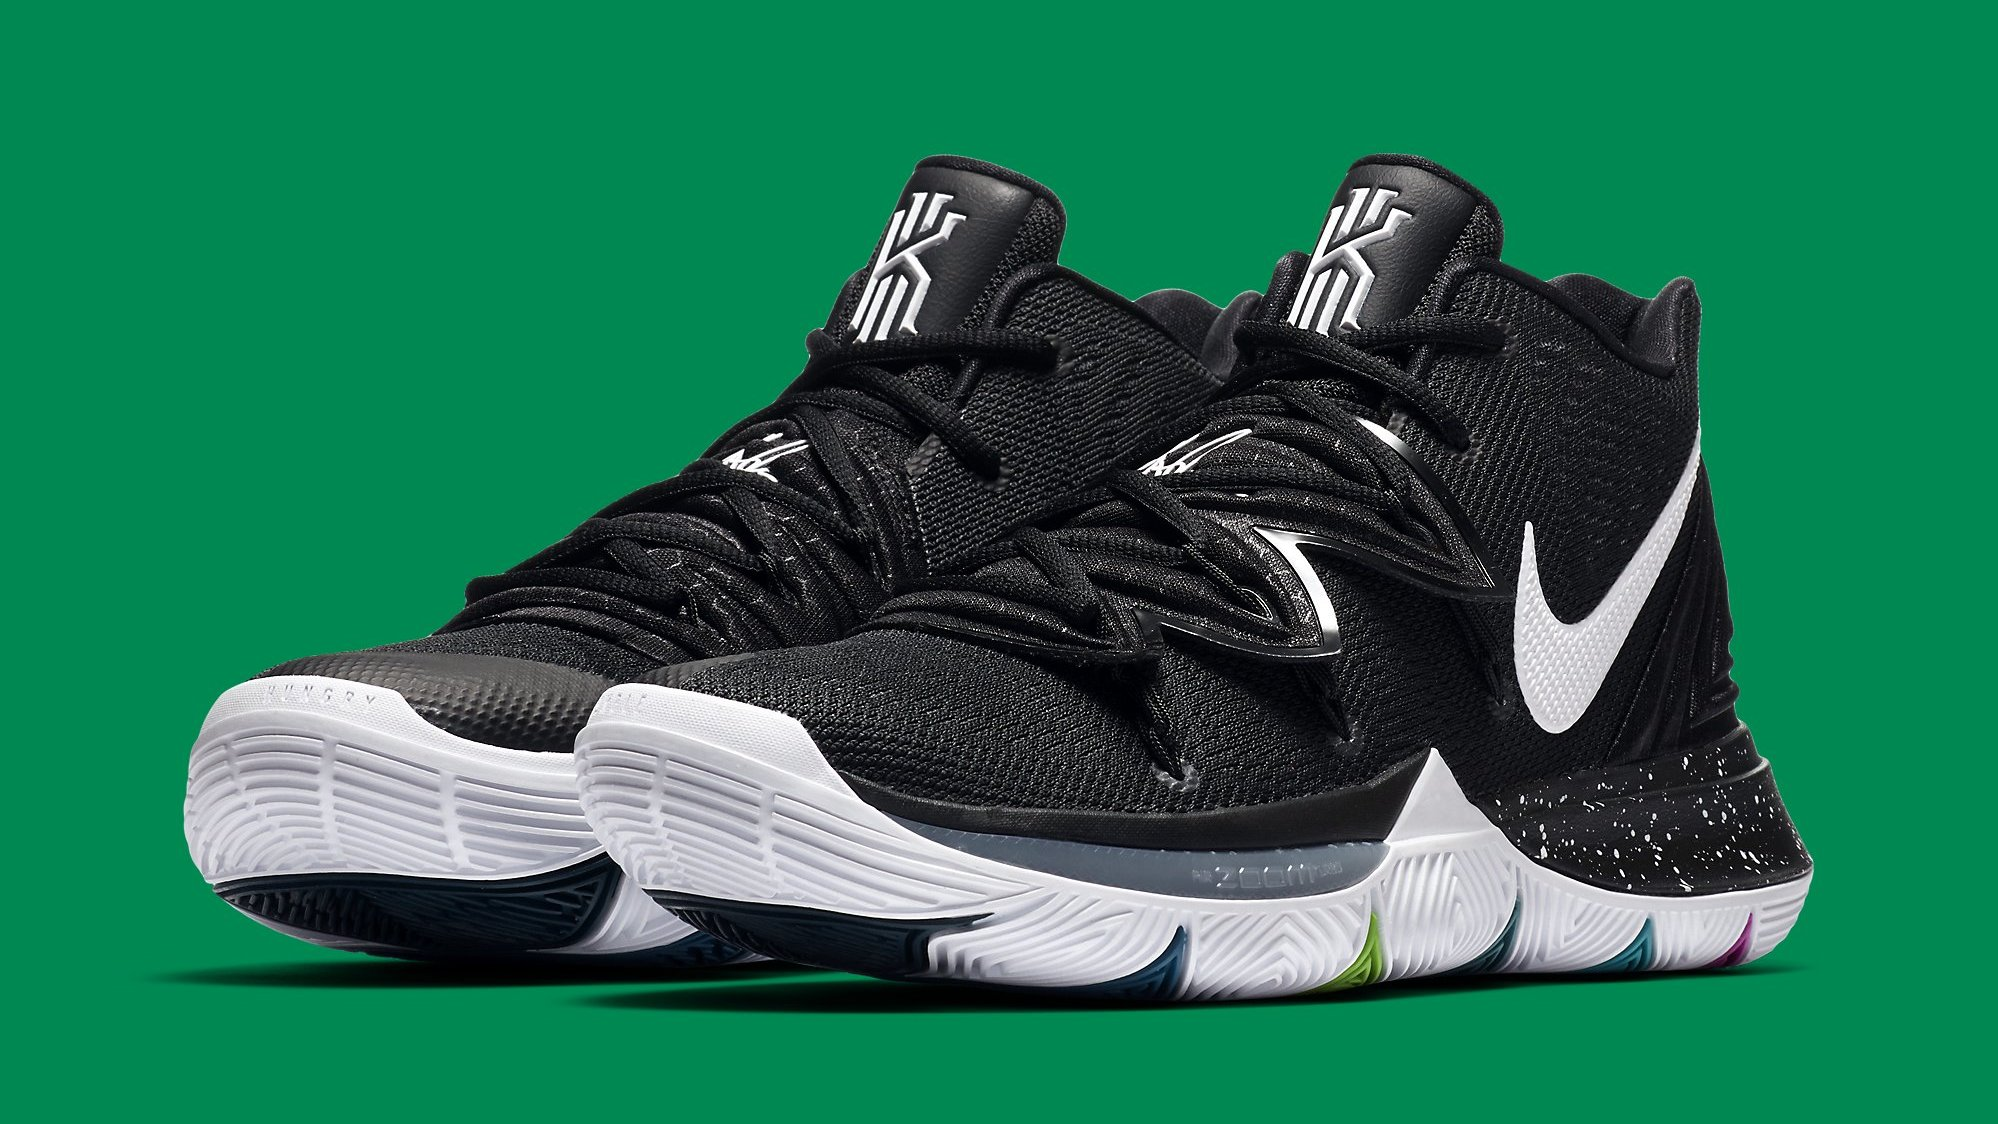 199c624d657f Nike Kyrie 5 Black Magic Release Date AO2918-901 Pair